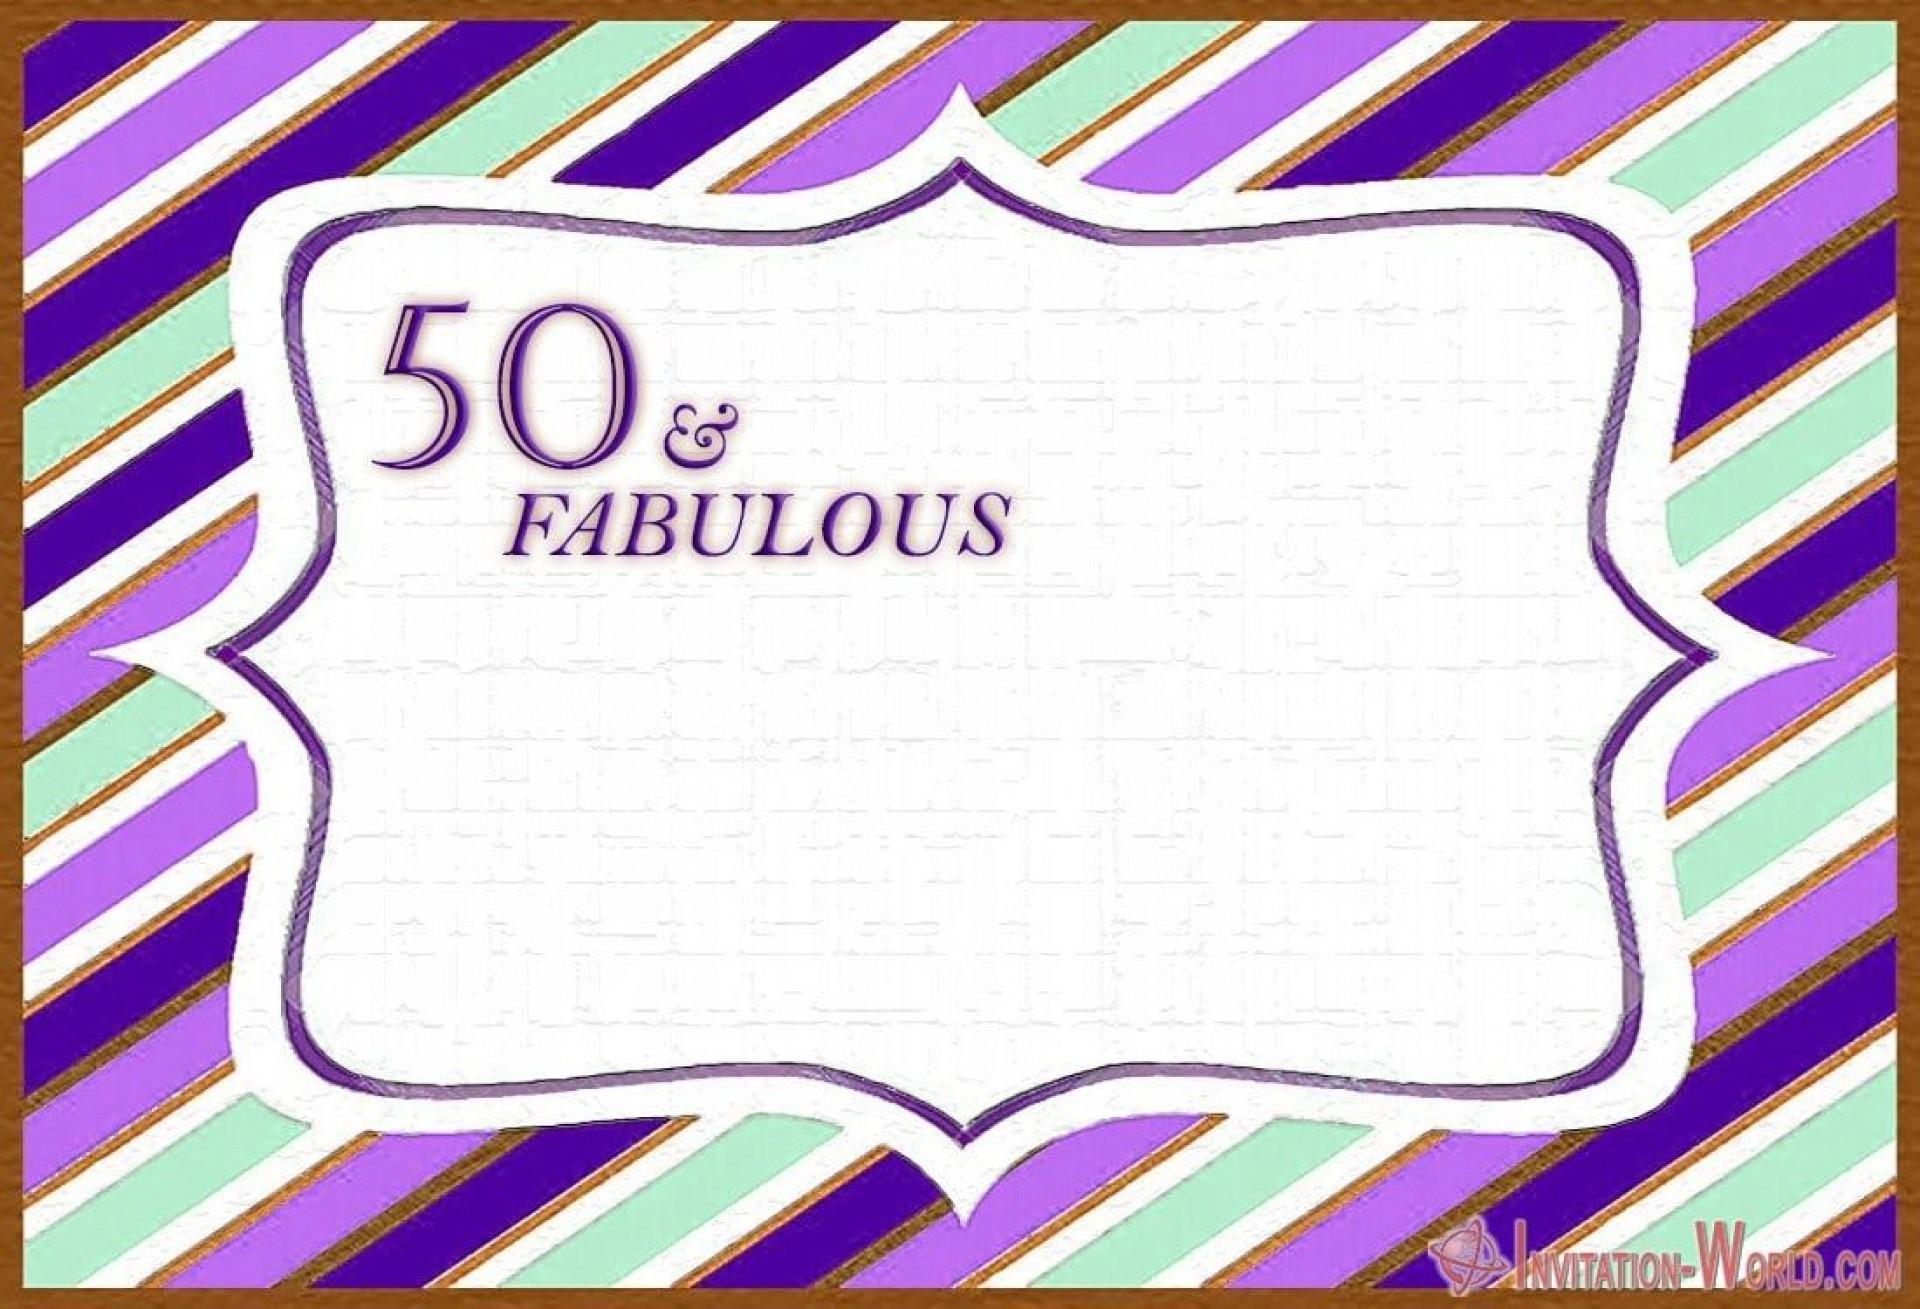 002 Fantastic Birthday Invite Template Word Free High Def  Party Invitation1920